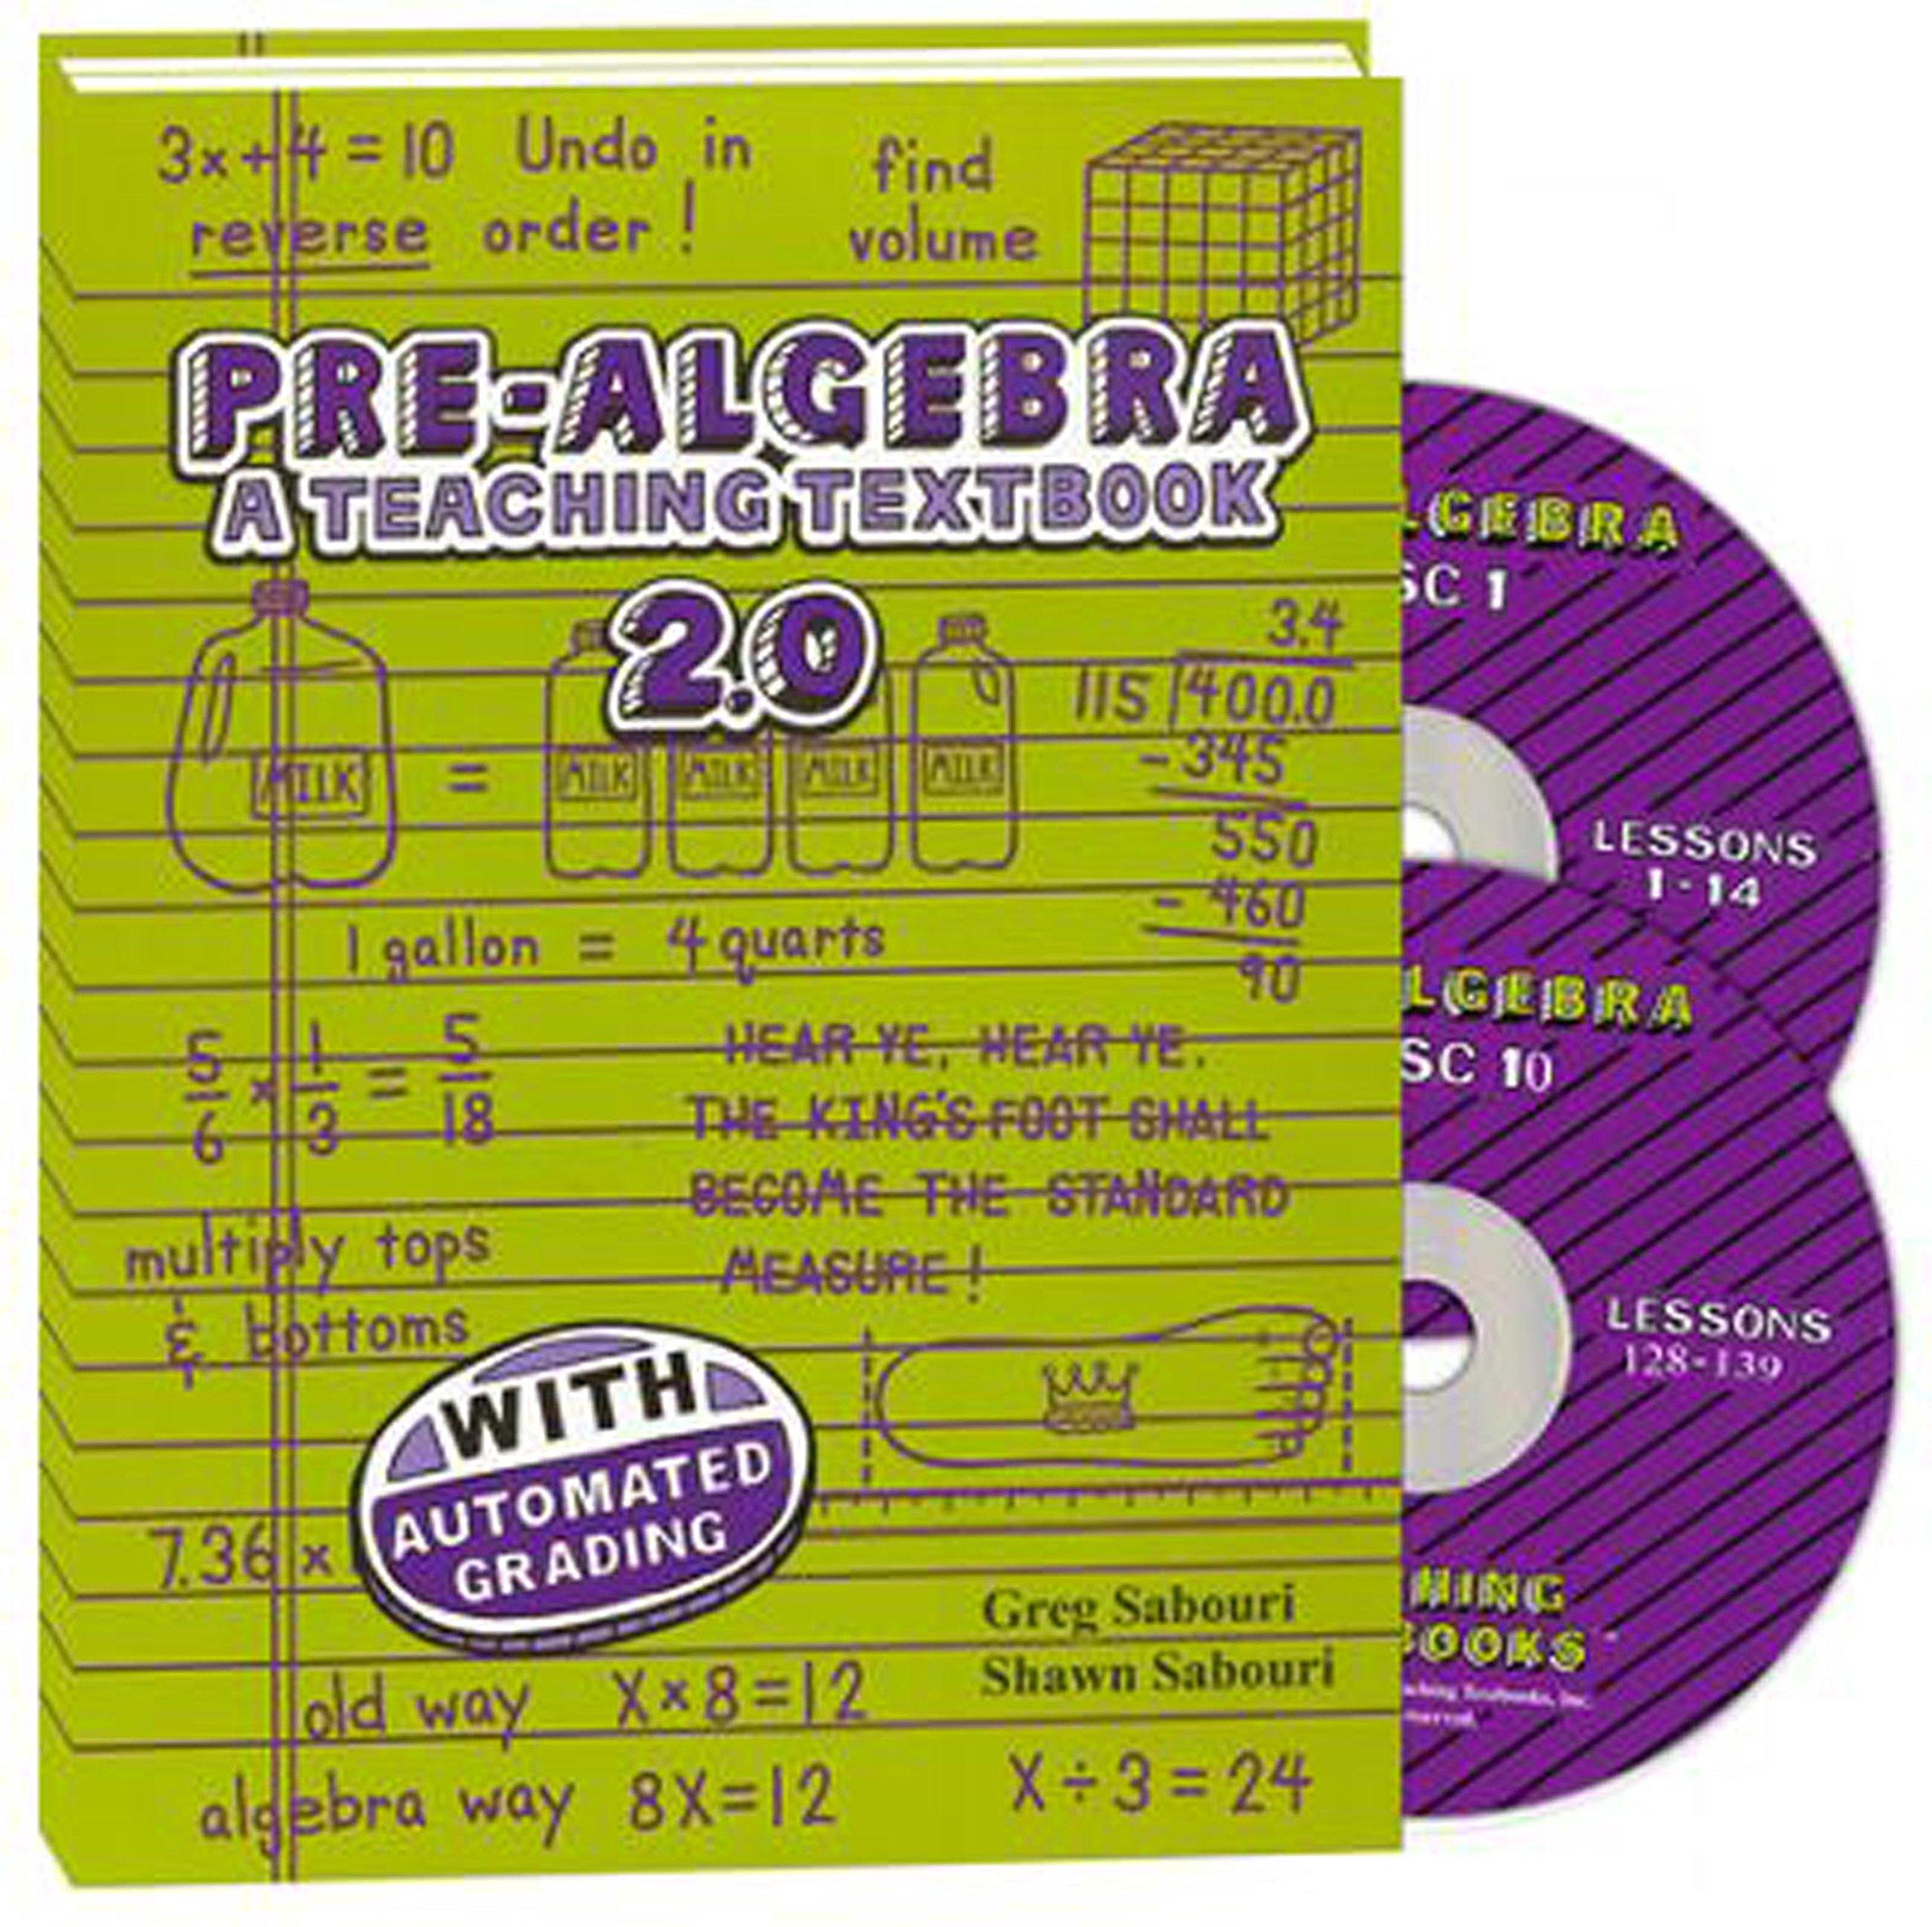 Teaching Textbooks: Pre-Algebra CD-Rom Set, Version 2.0: Amazon.com: Books